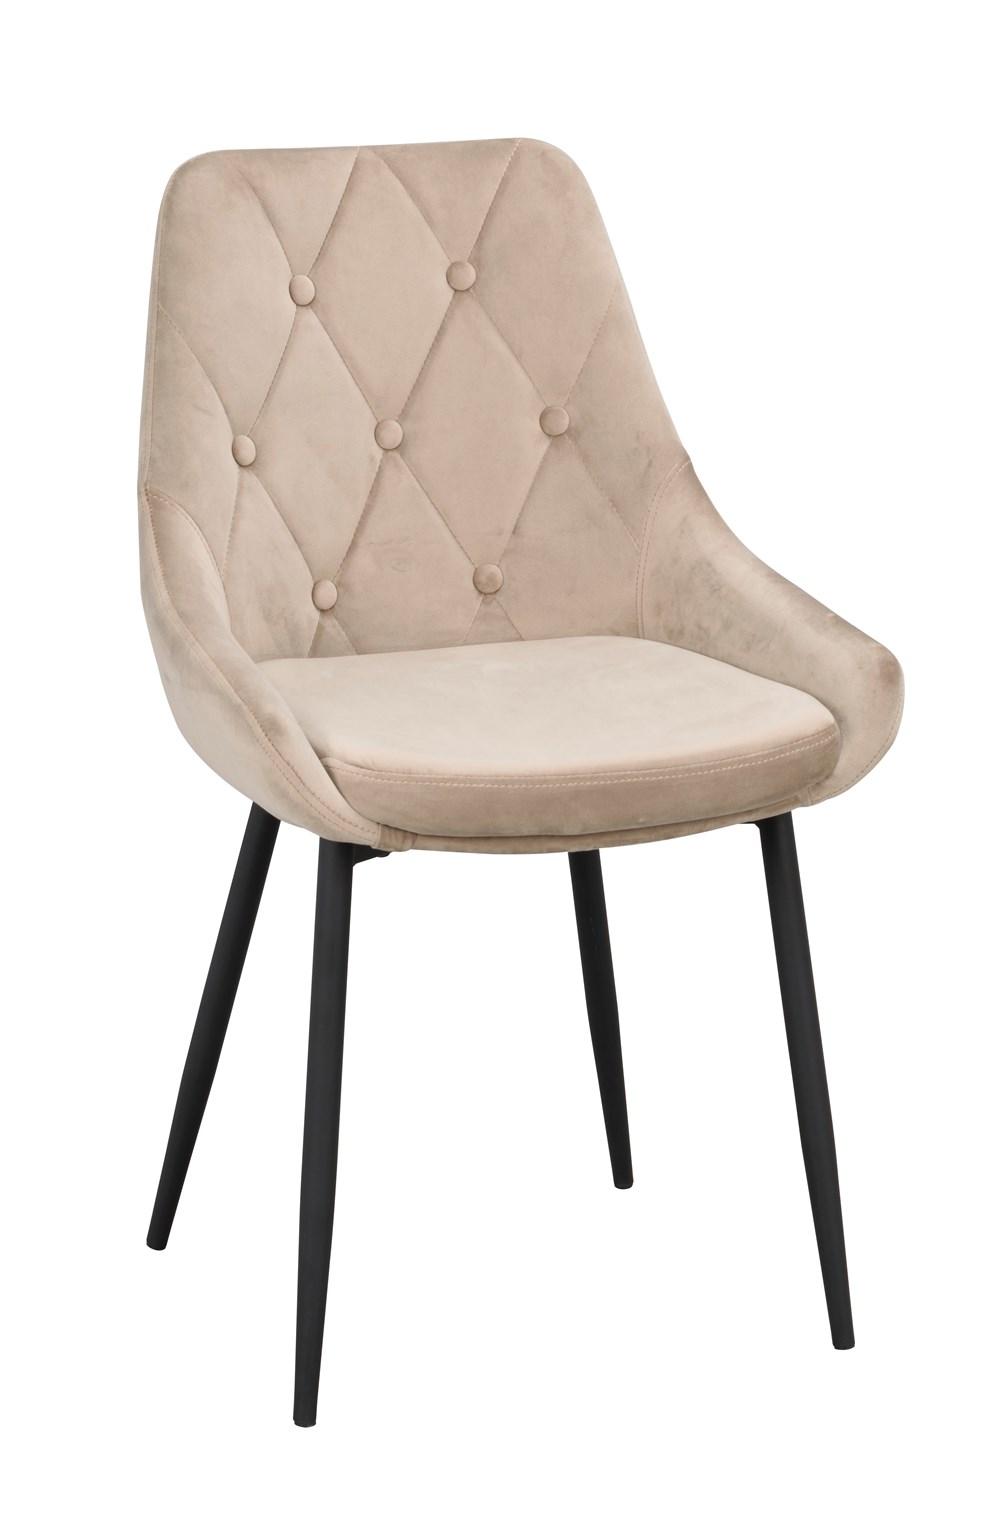 Alberton tuoli beige sametti/musta metalli, Rowico